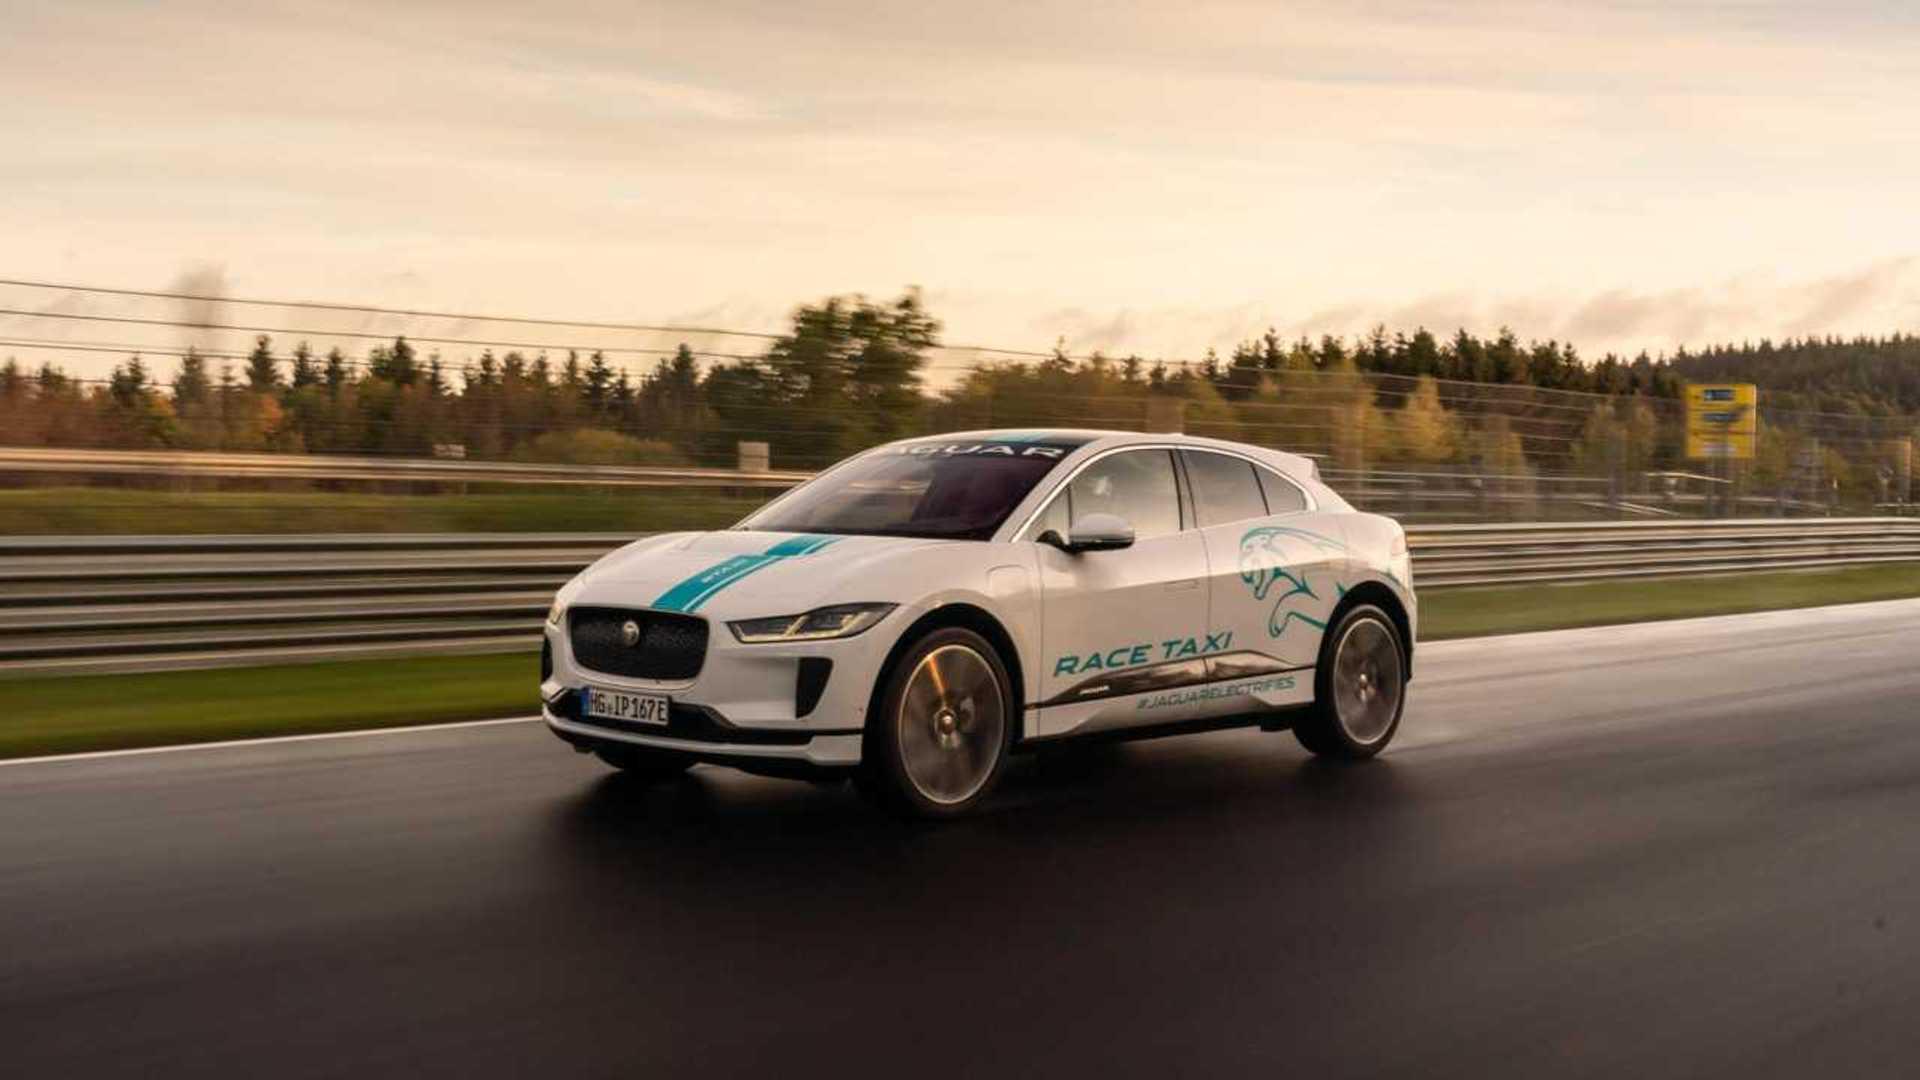 Jaguar Launches I-PACE RACE eTAXI At The Nürburgring